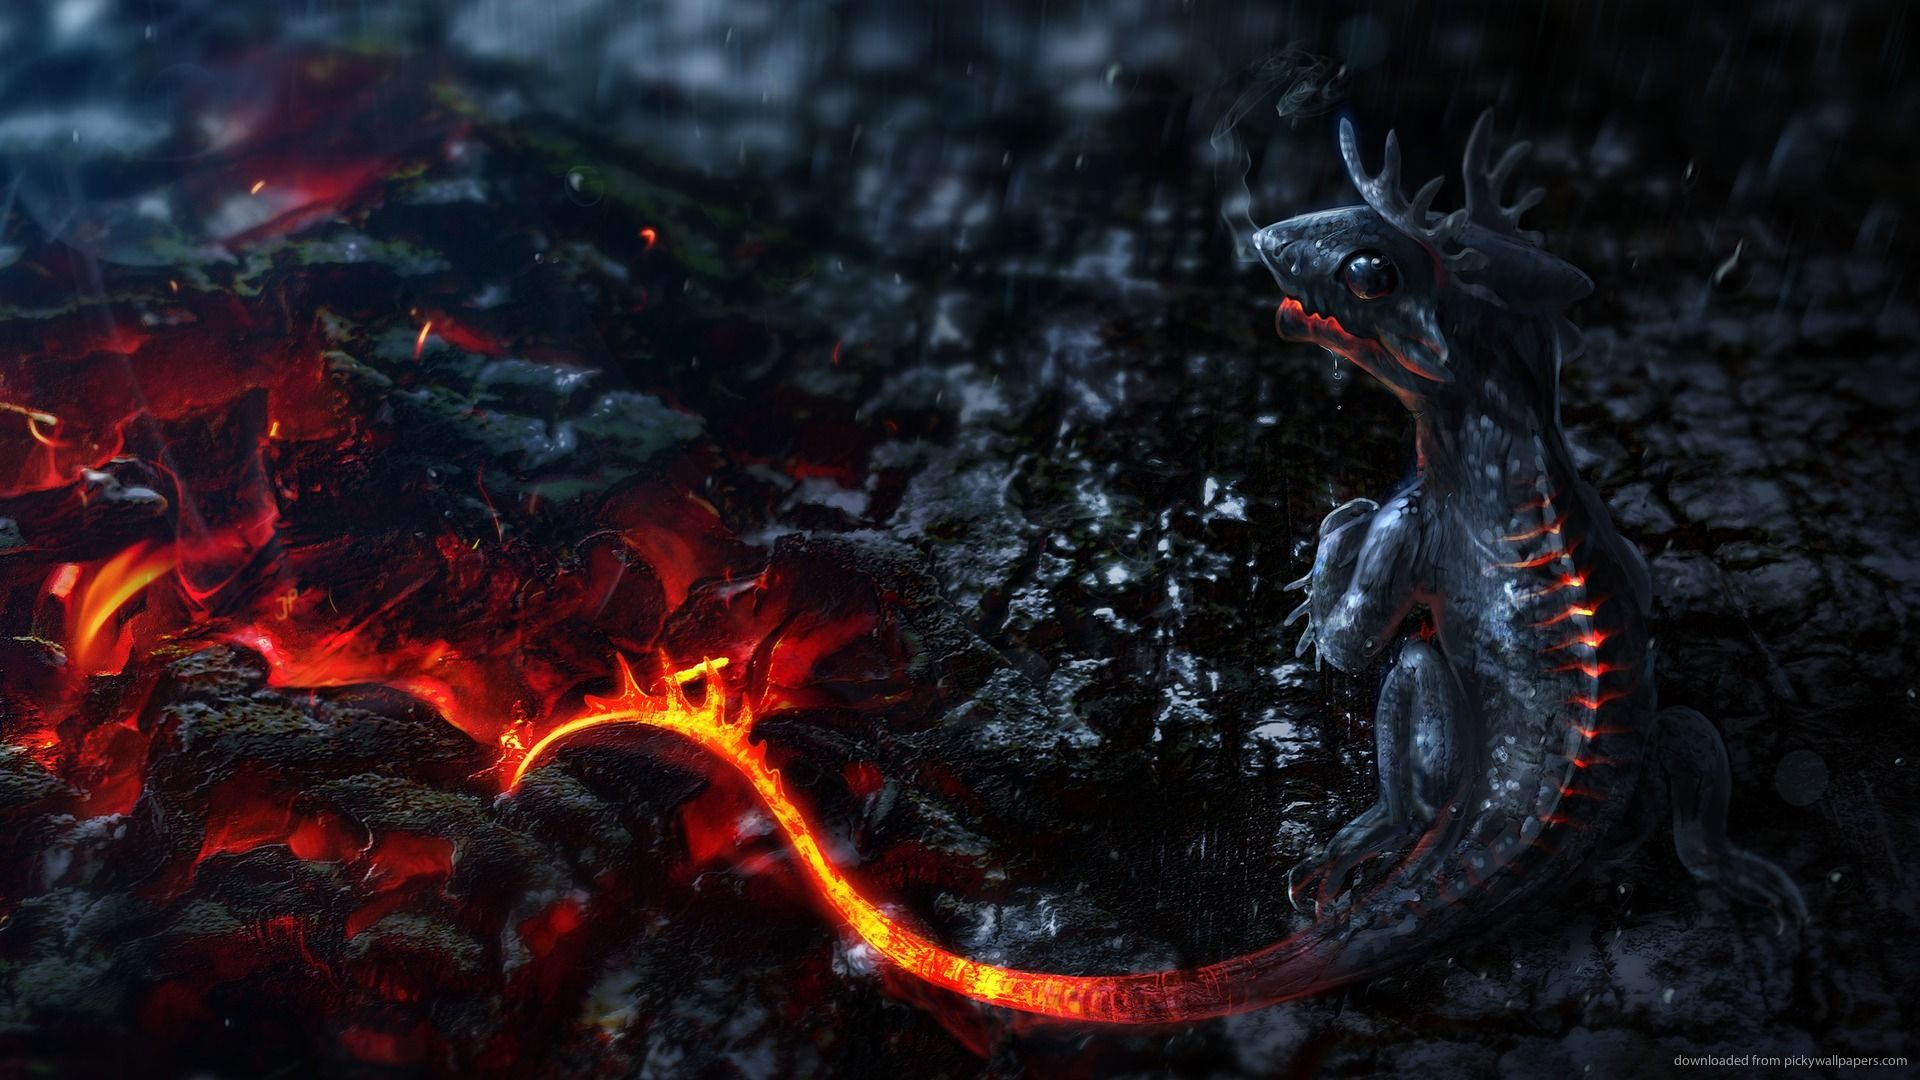 mx lava wallpapers lava adorable desktop images for free hd